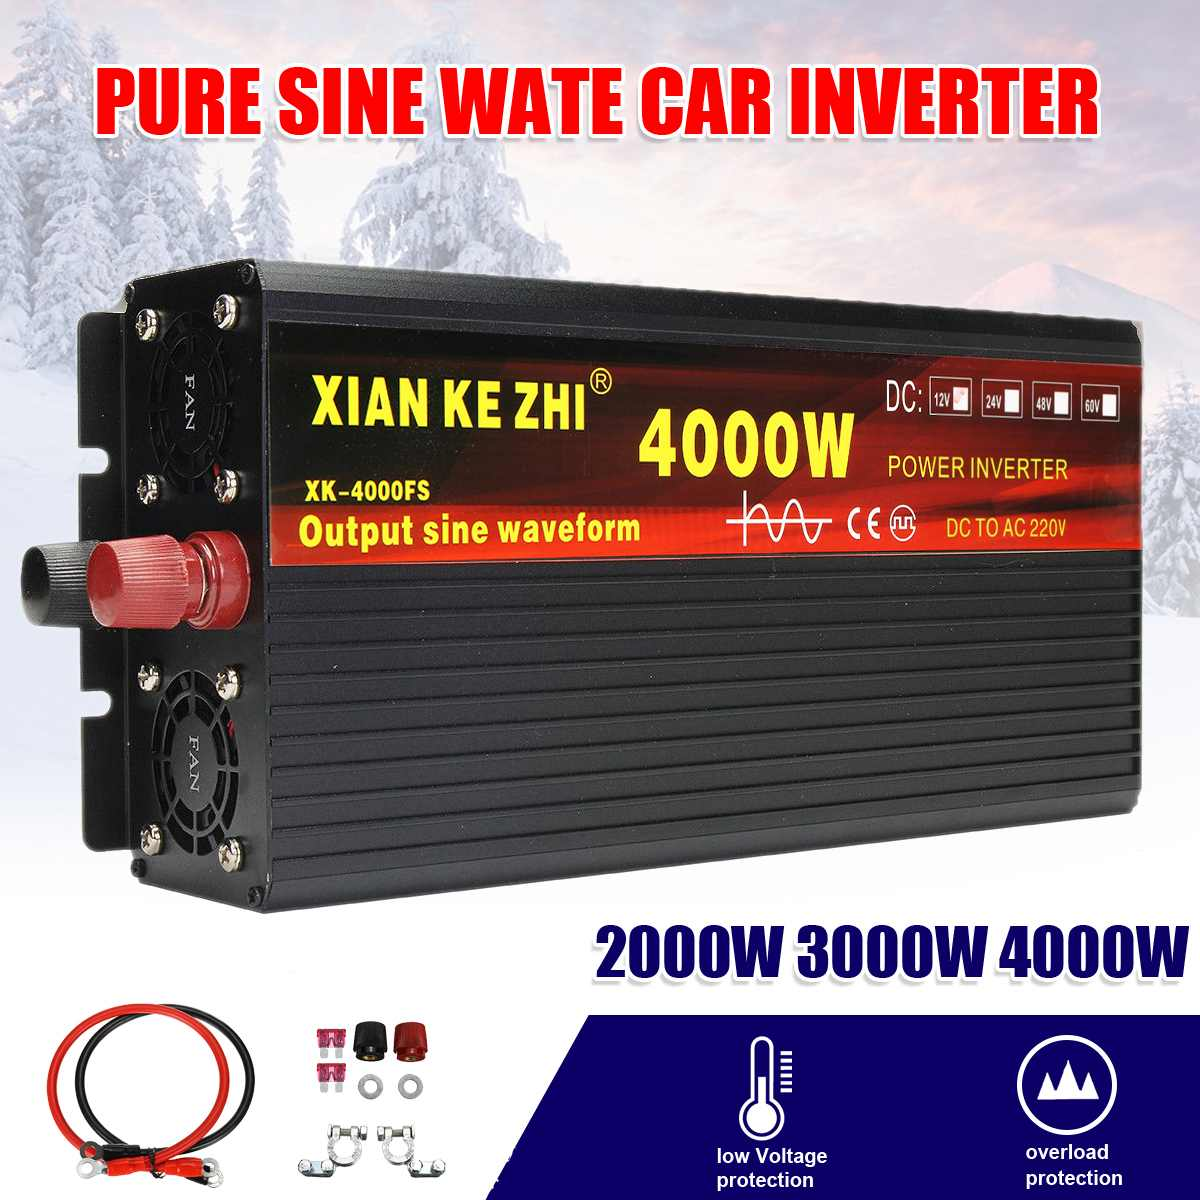 Auto Inverter 12V 220V 2000/3000/4000W Spannung transformator Reine Sinus Welle Power Inverter DC12V /24V zu 220V Konverter + 2 LED Displa